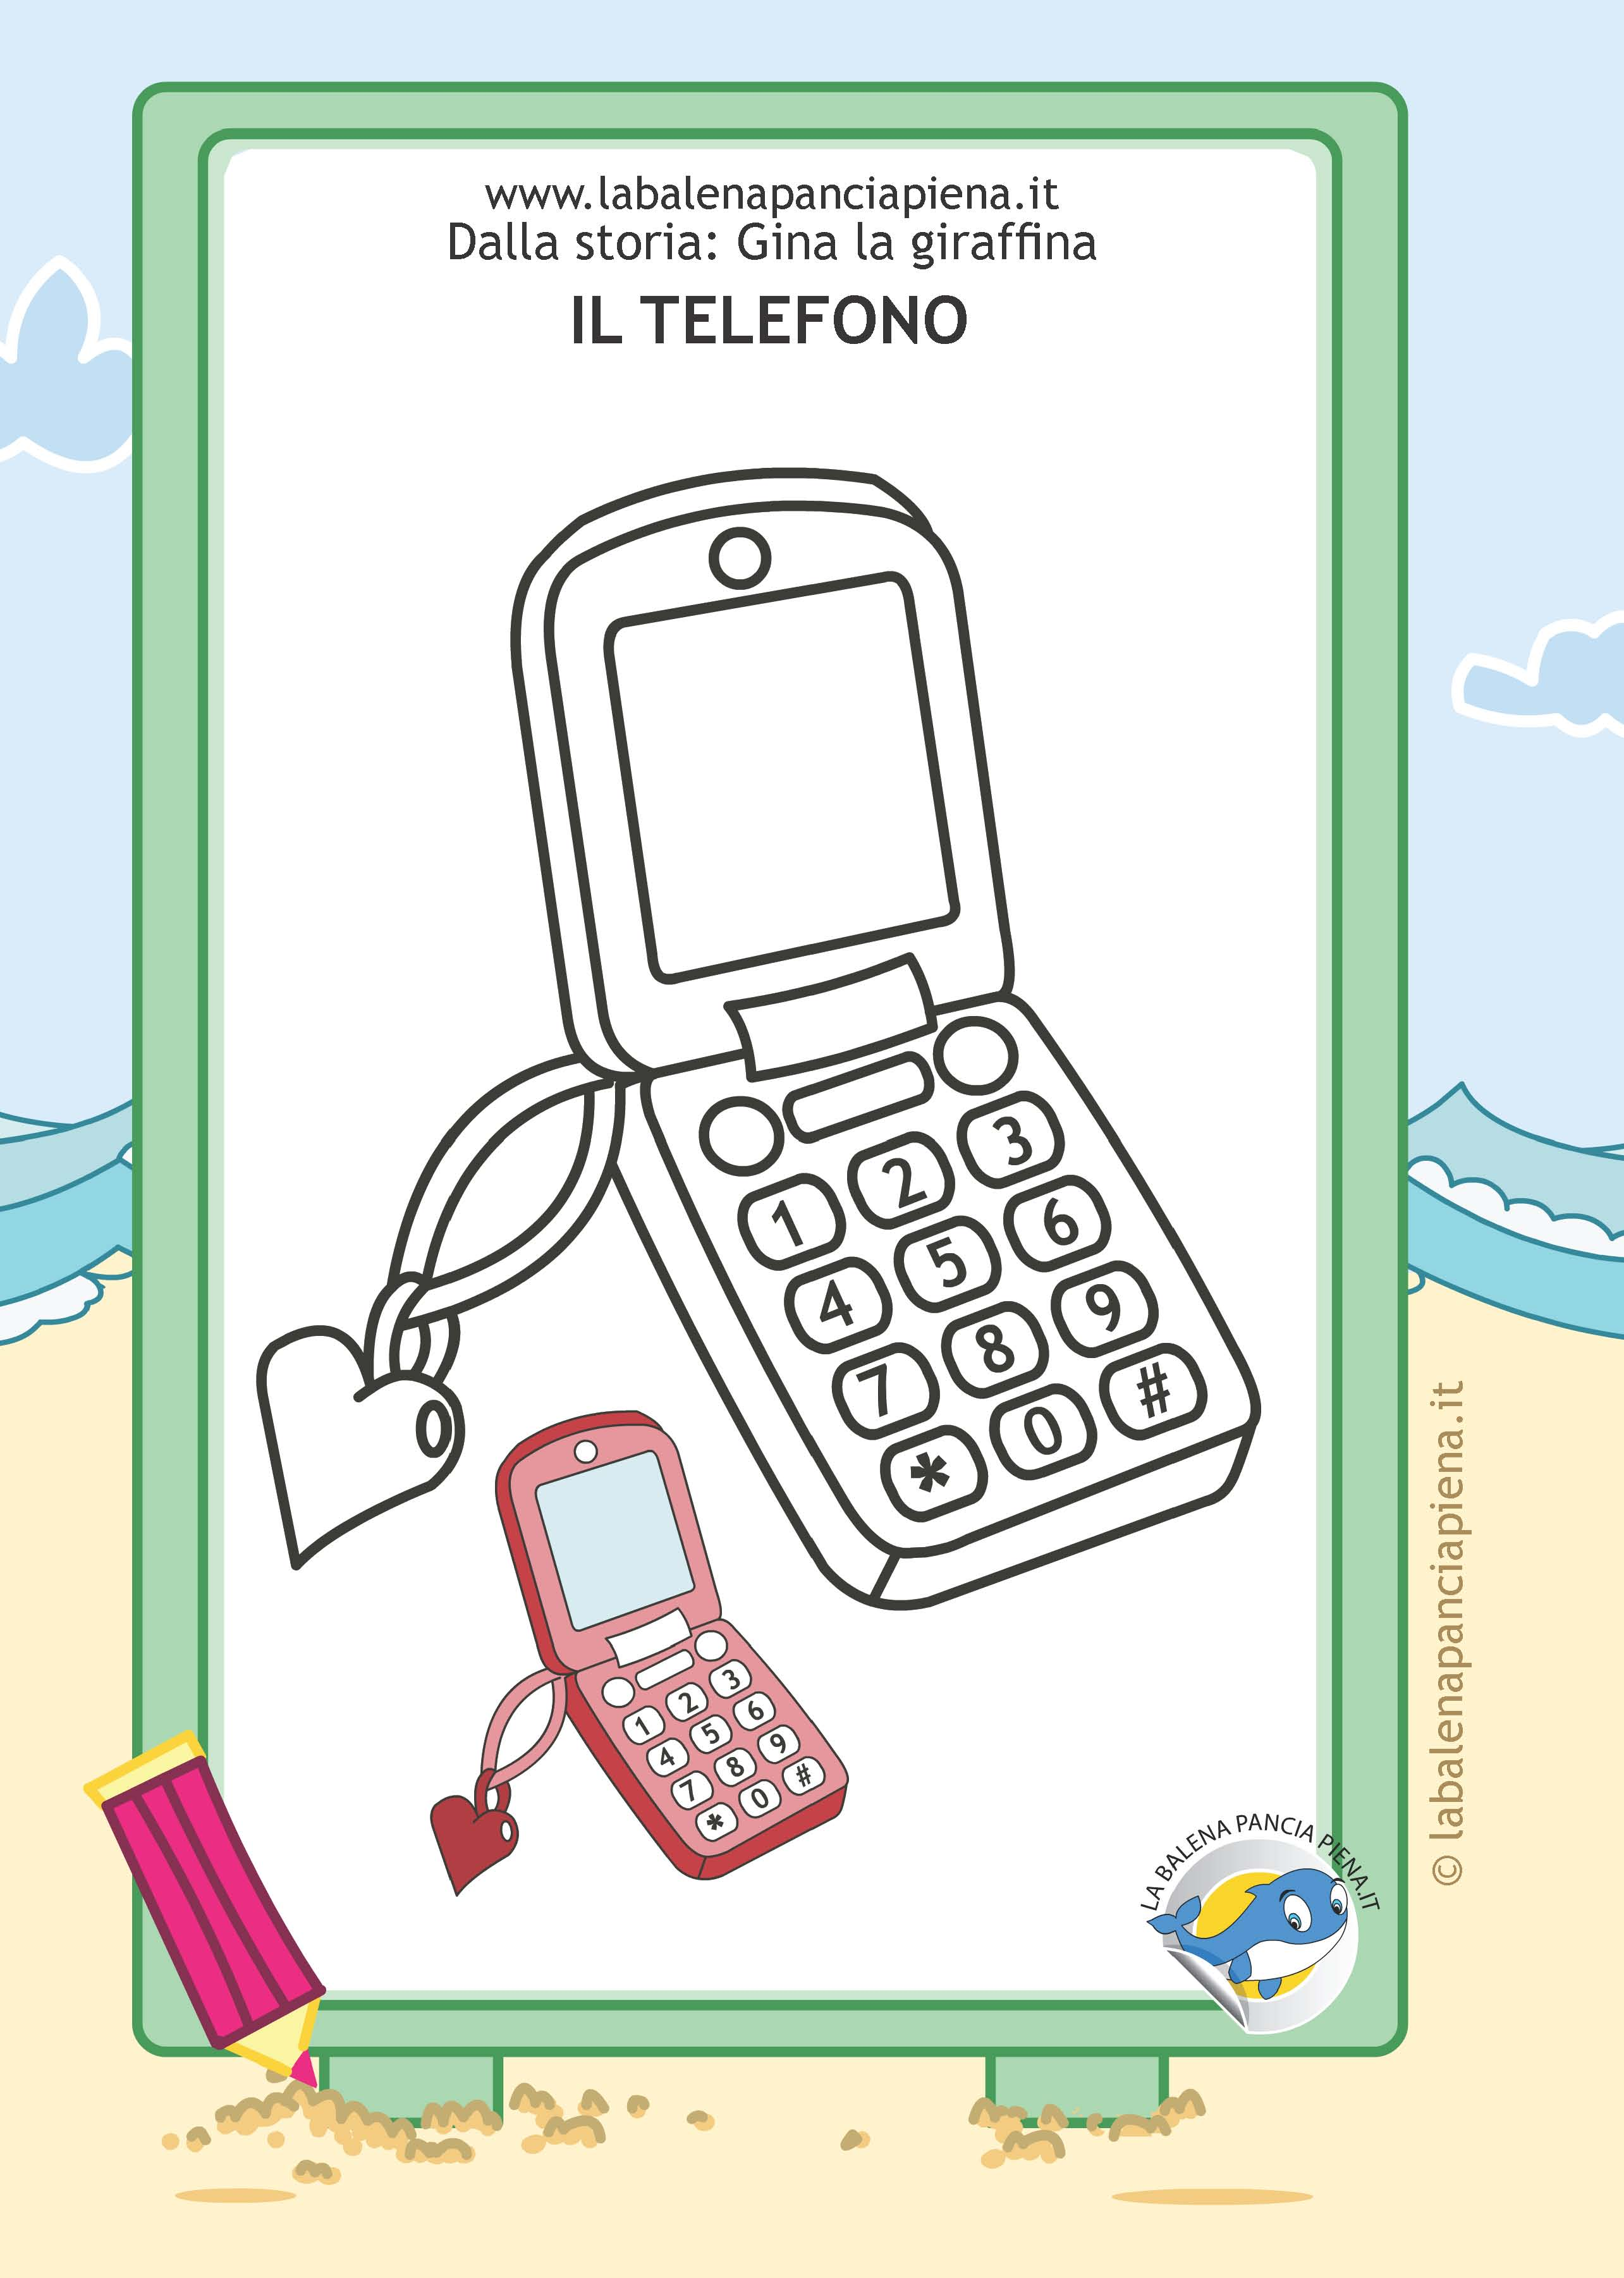 Labalenapanciapienait App E Libri Digitali